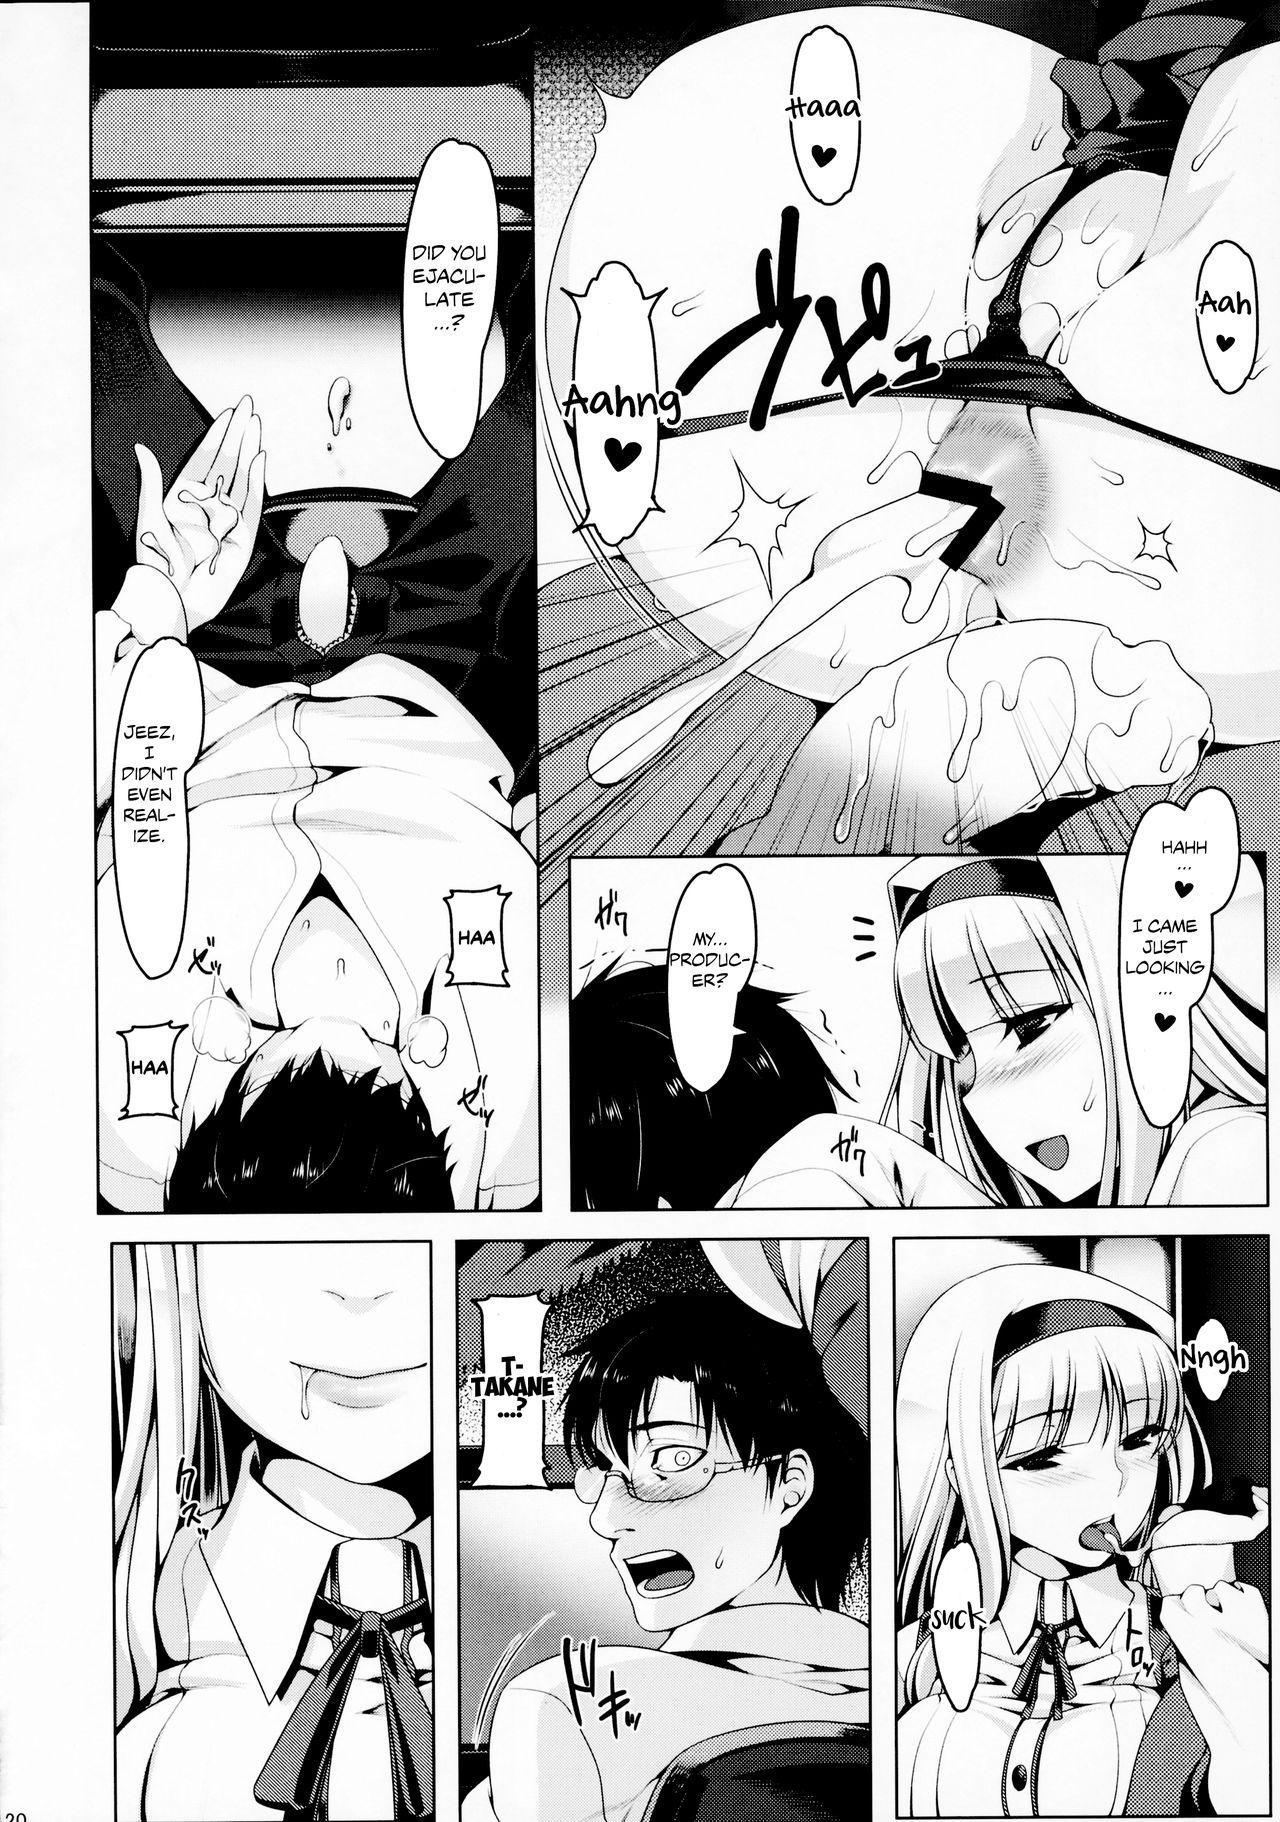 Oshirihime no Renbin | Compassion of the Anal Princess 18